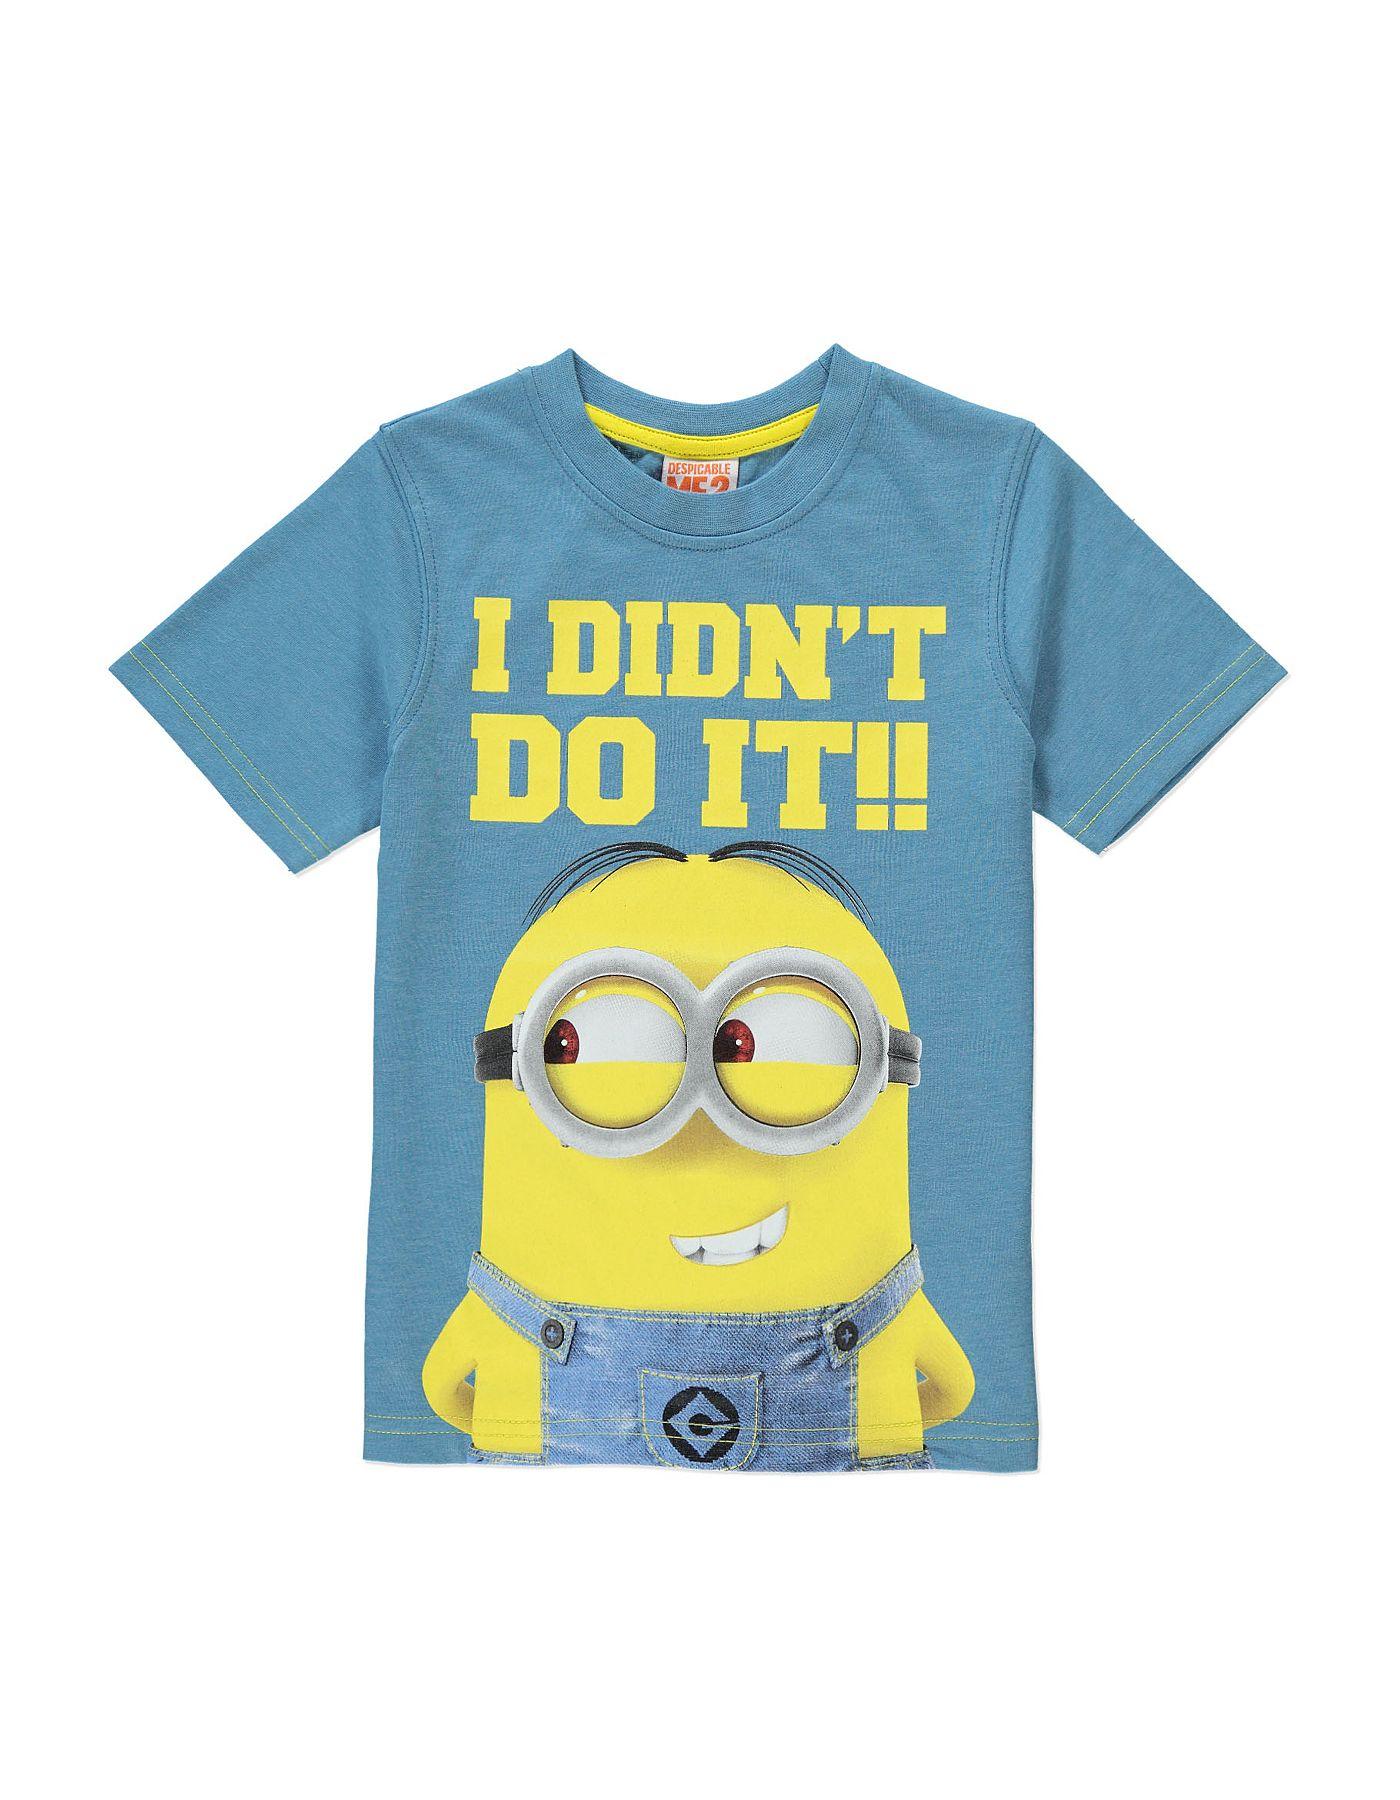 Black t shirt asda - Minion T Shirt